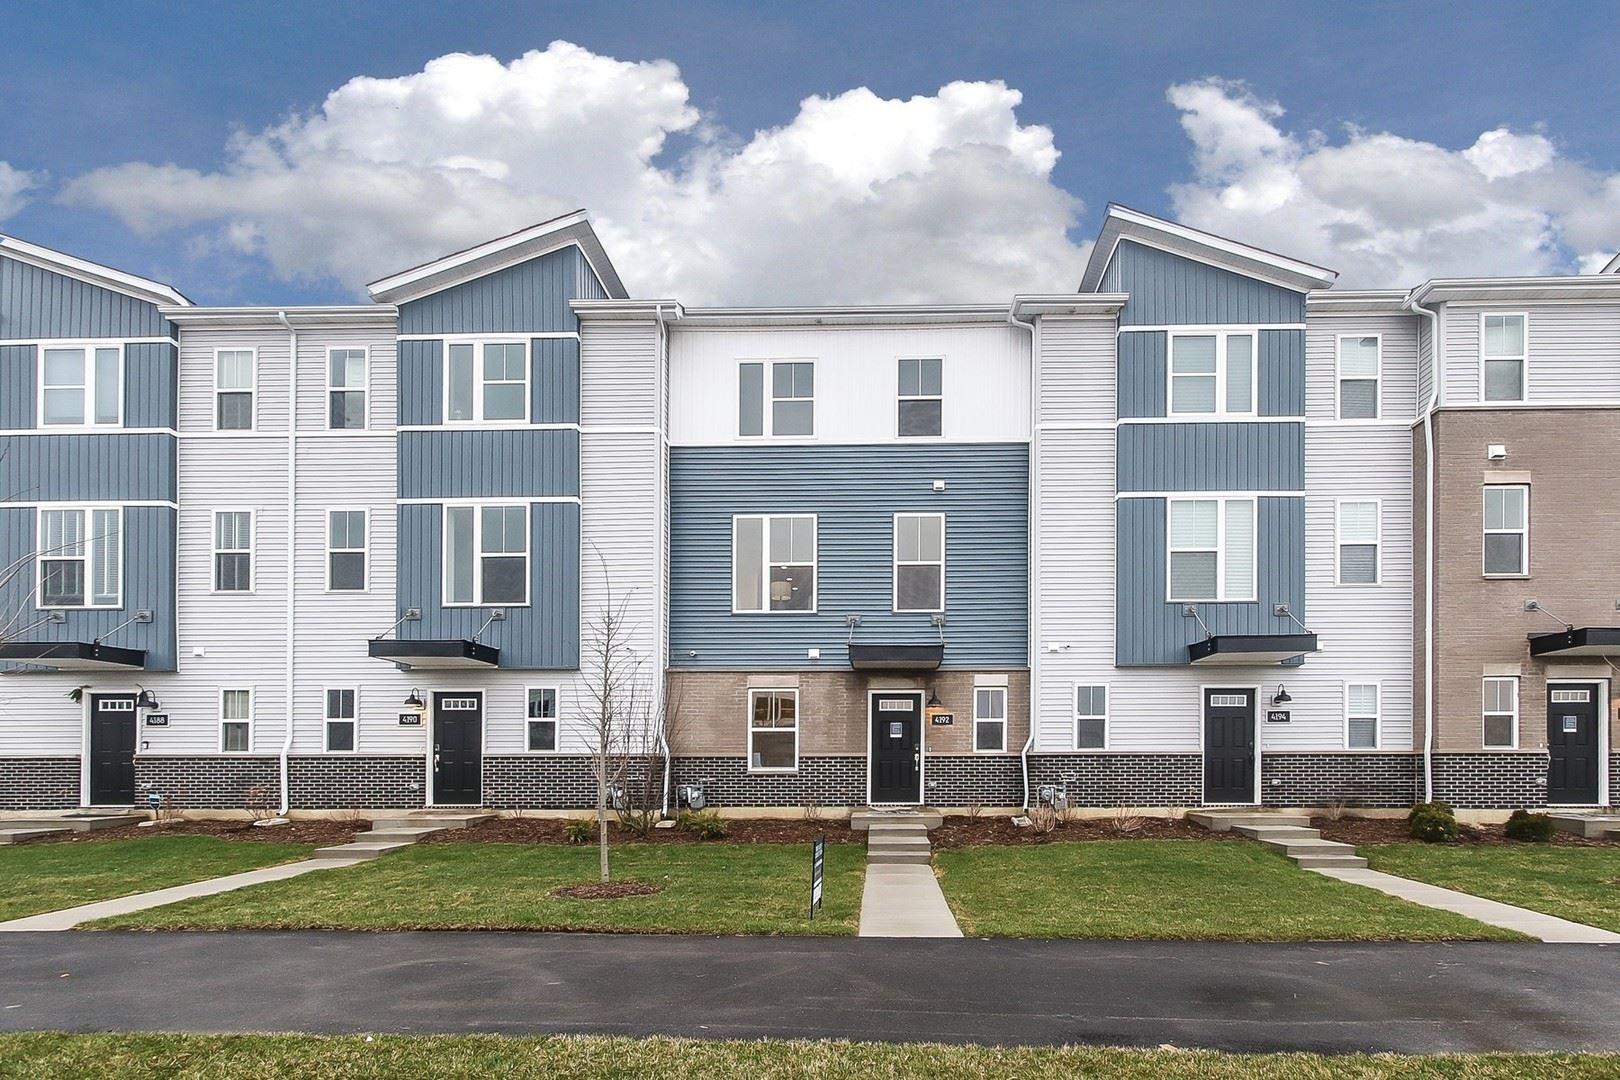 4192 Irving Lot #21.04 Road, Aurora, IL 60504 - #: 10573875